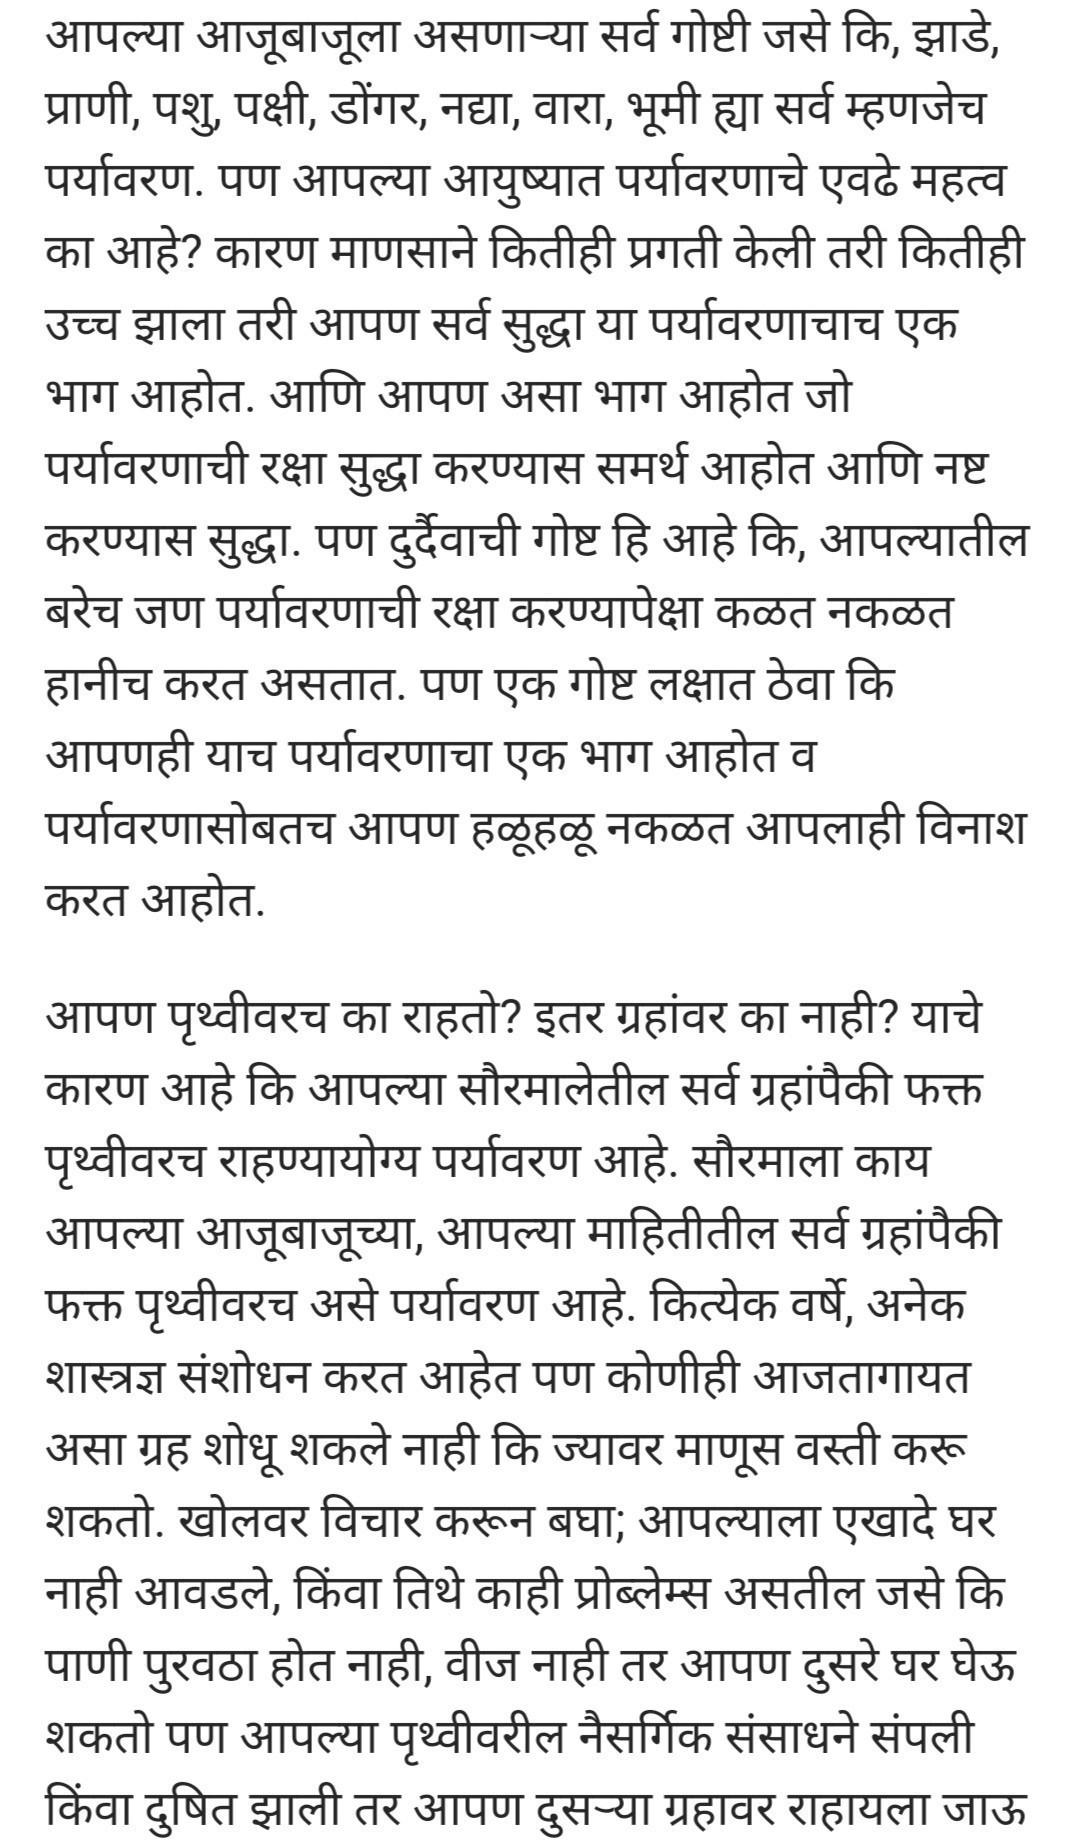 12th paryavaran project in marathi language